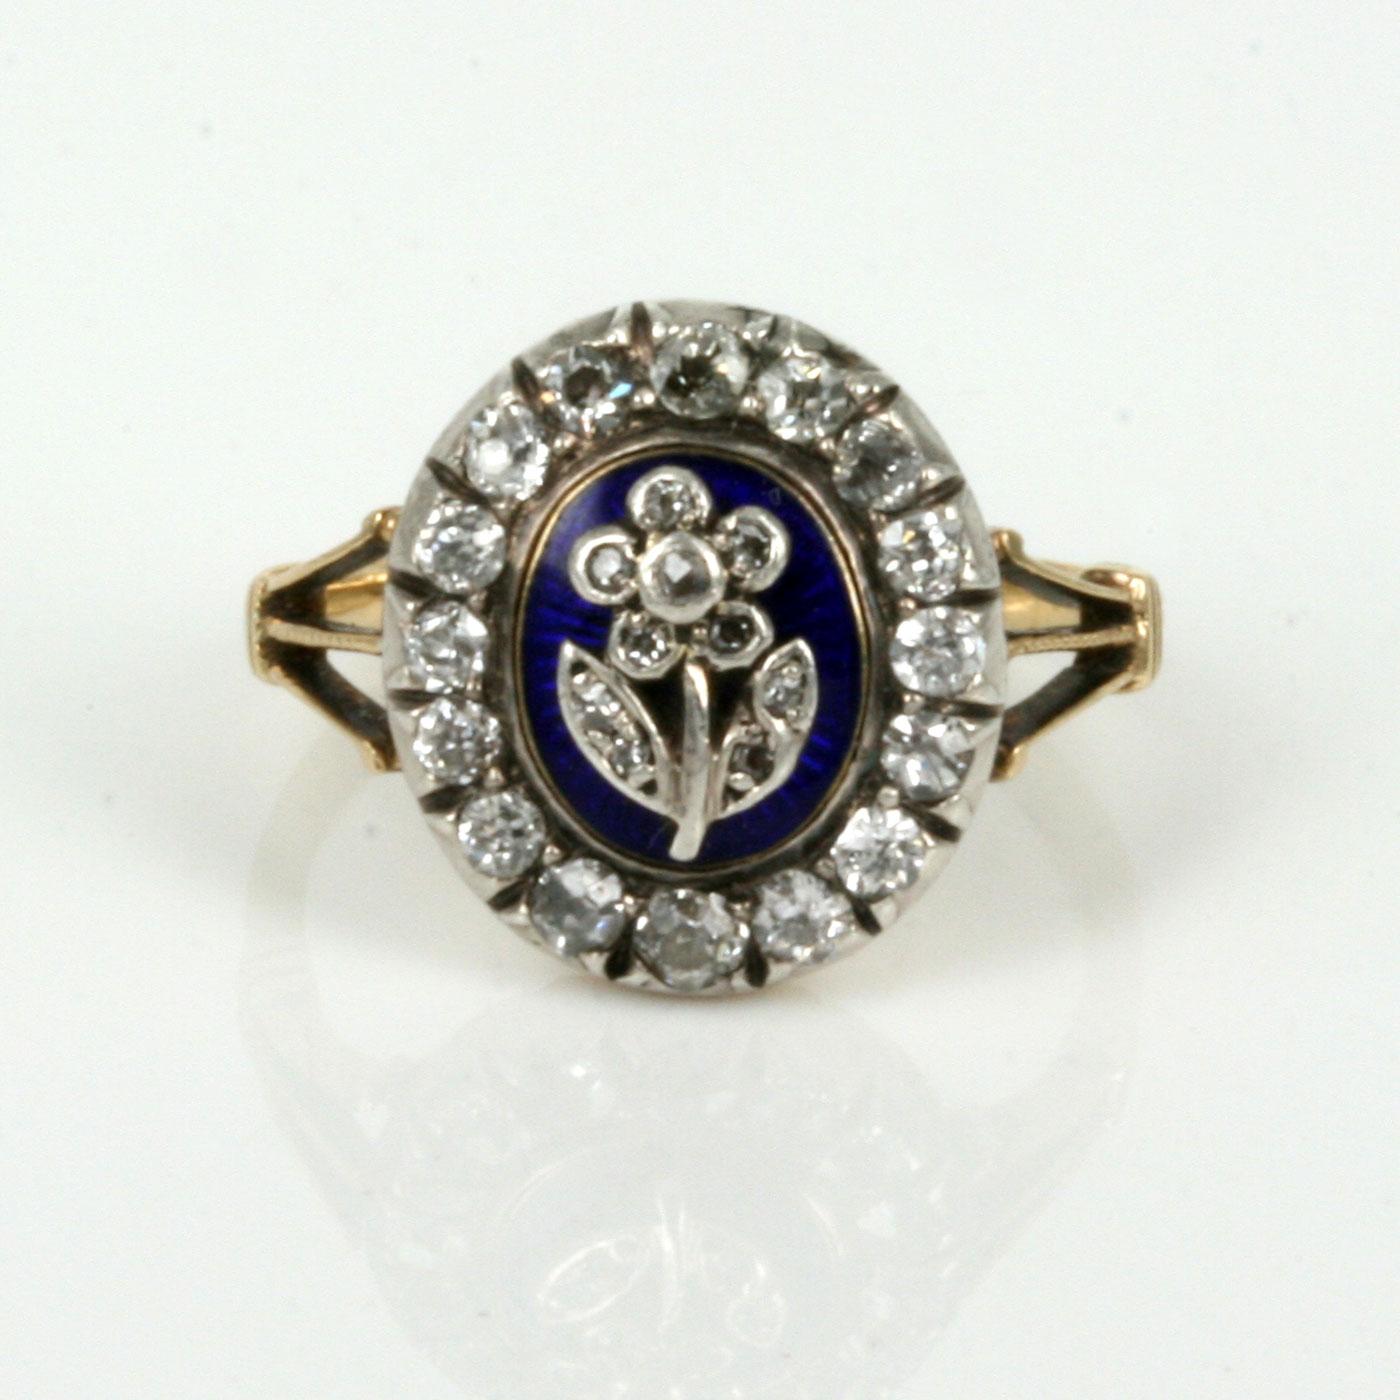 buy antique georgian era ring sold items sold